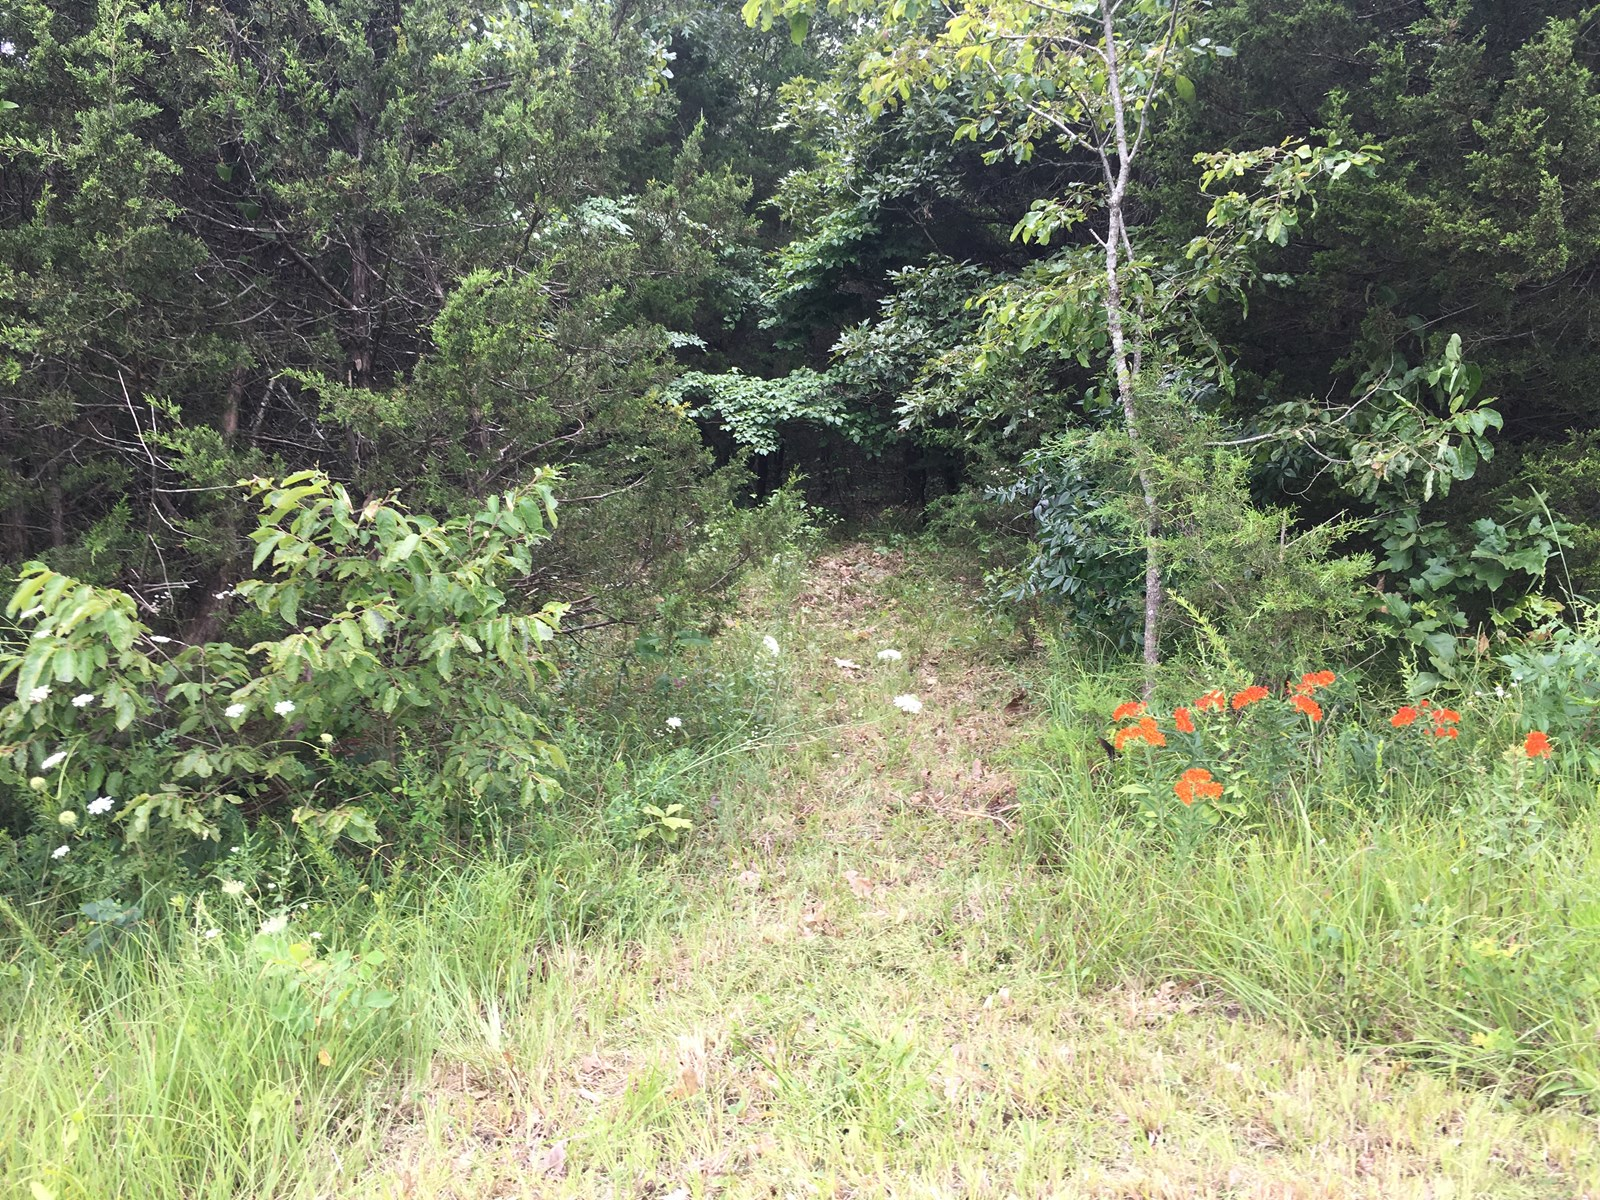 Pocahontas Arkansas Real Estate - AR Homes, Farms and